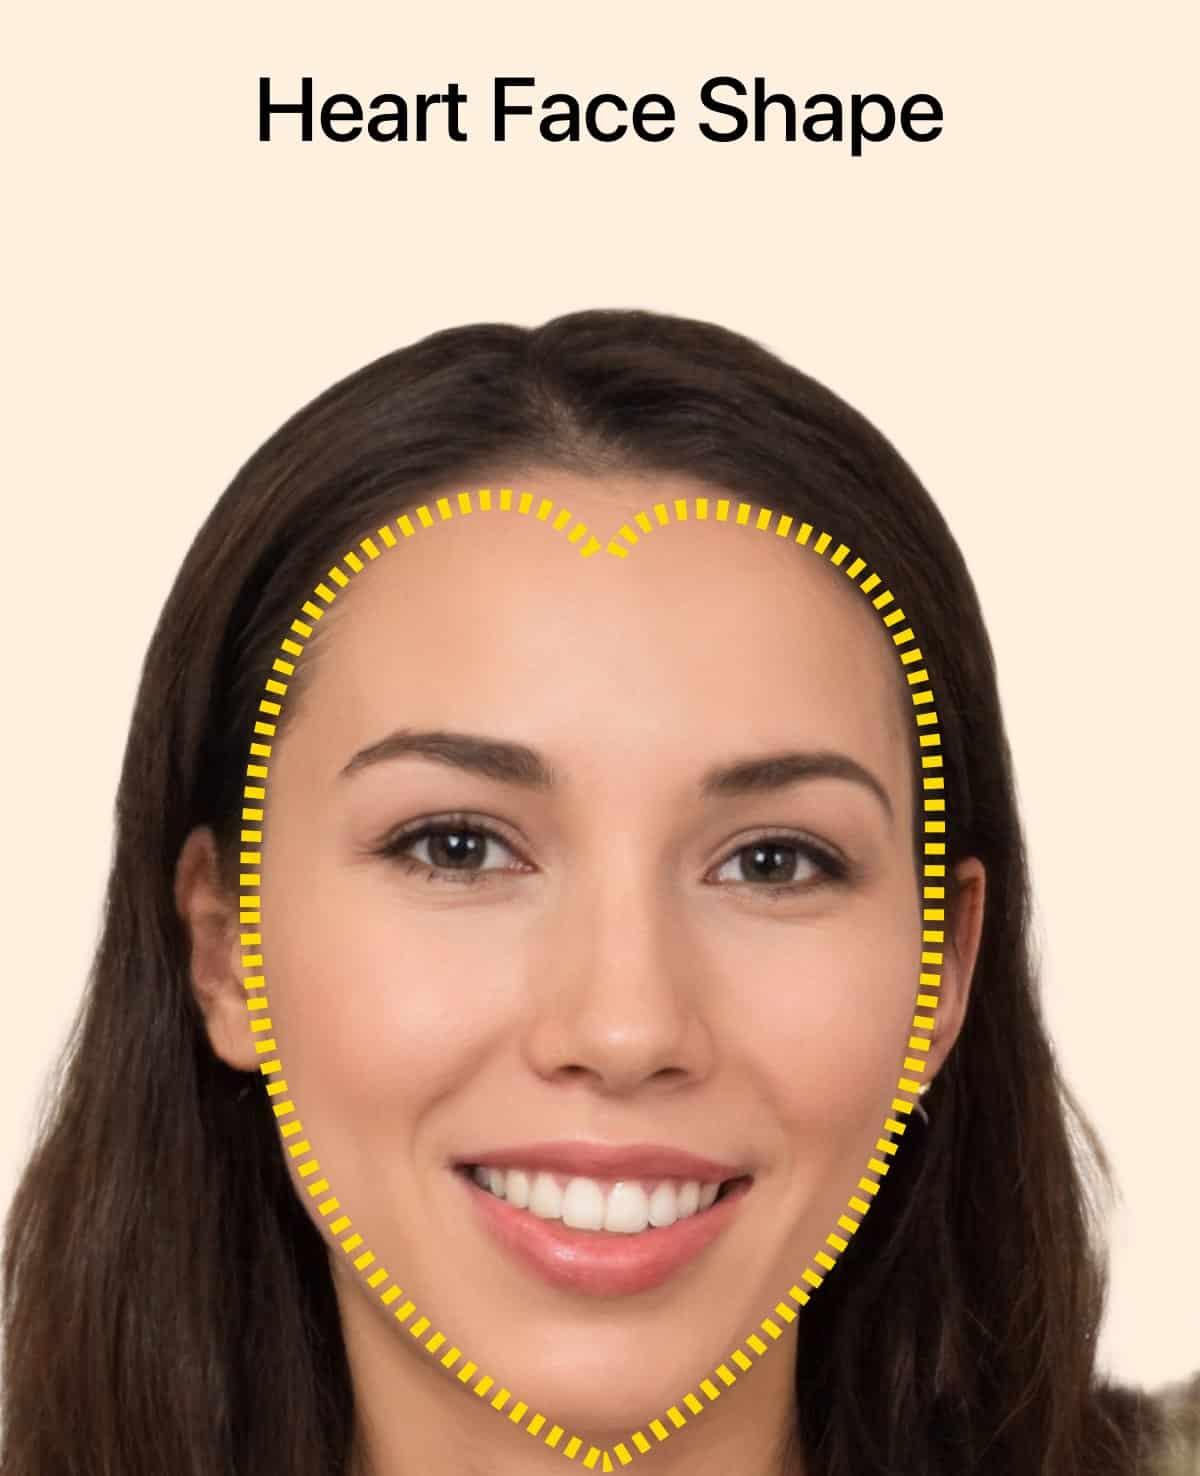 Forme de visage en cœur